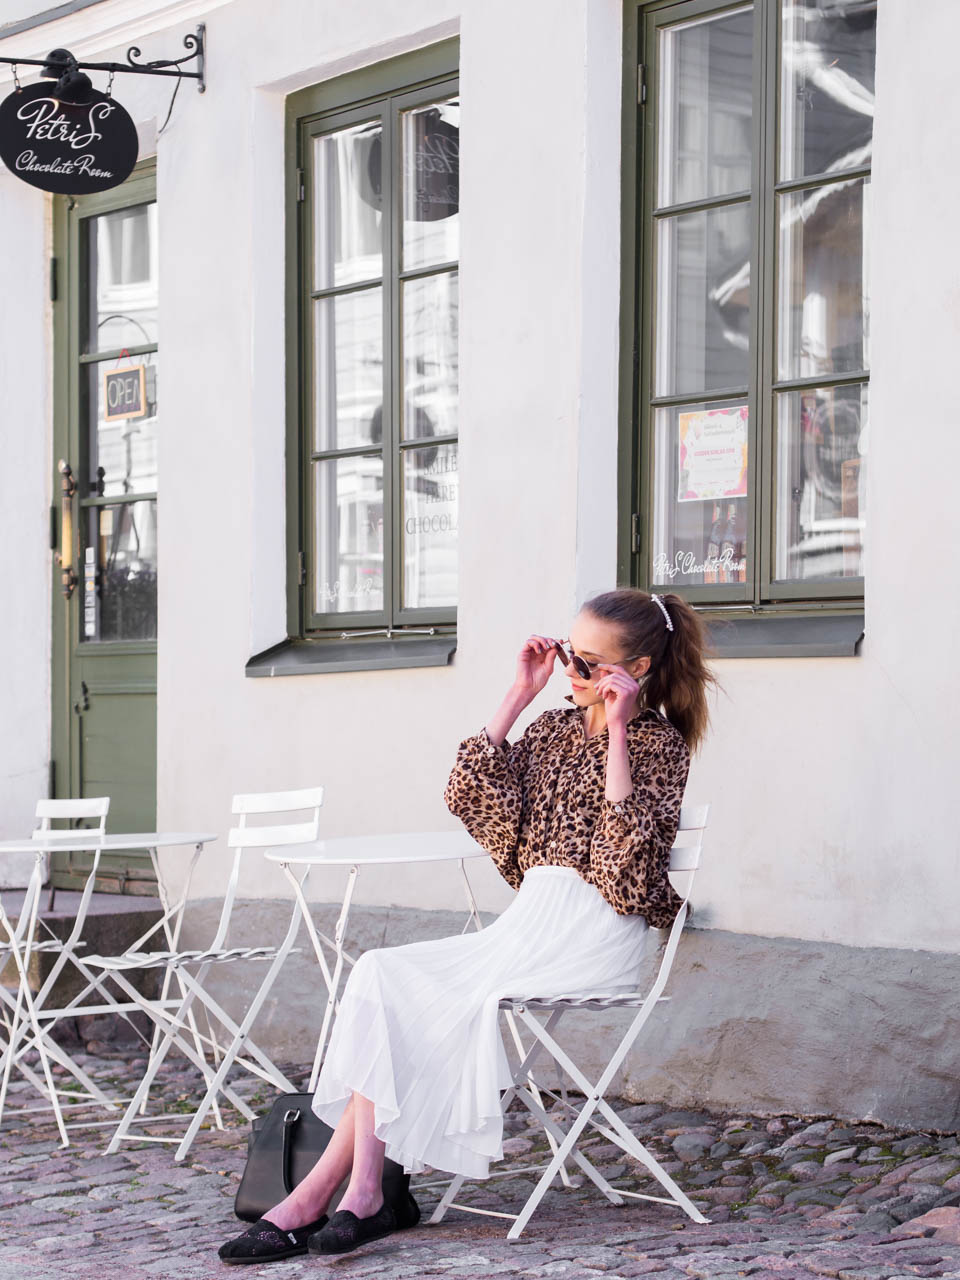 porvoo-cafes-restaurants-shops-fashion-blogger-summer-outfit